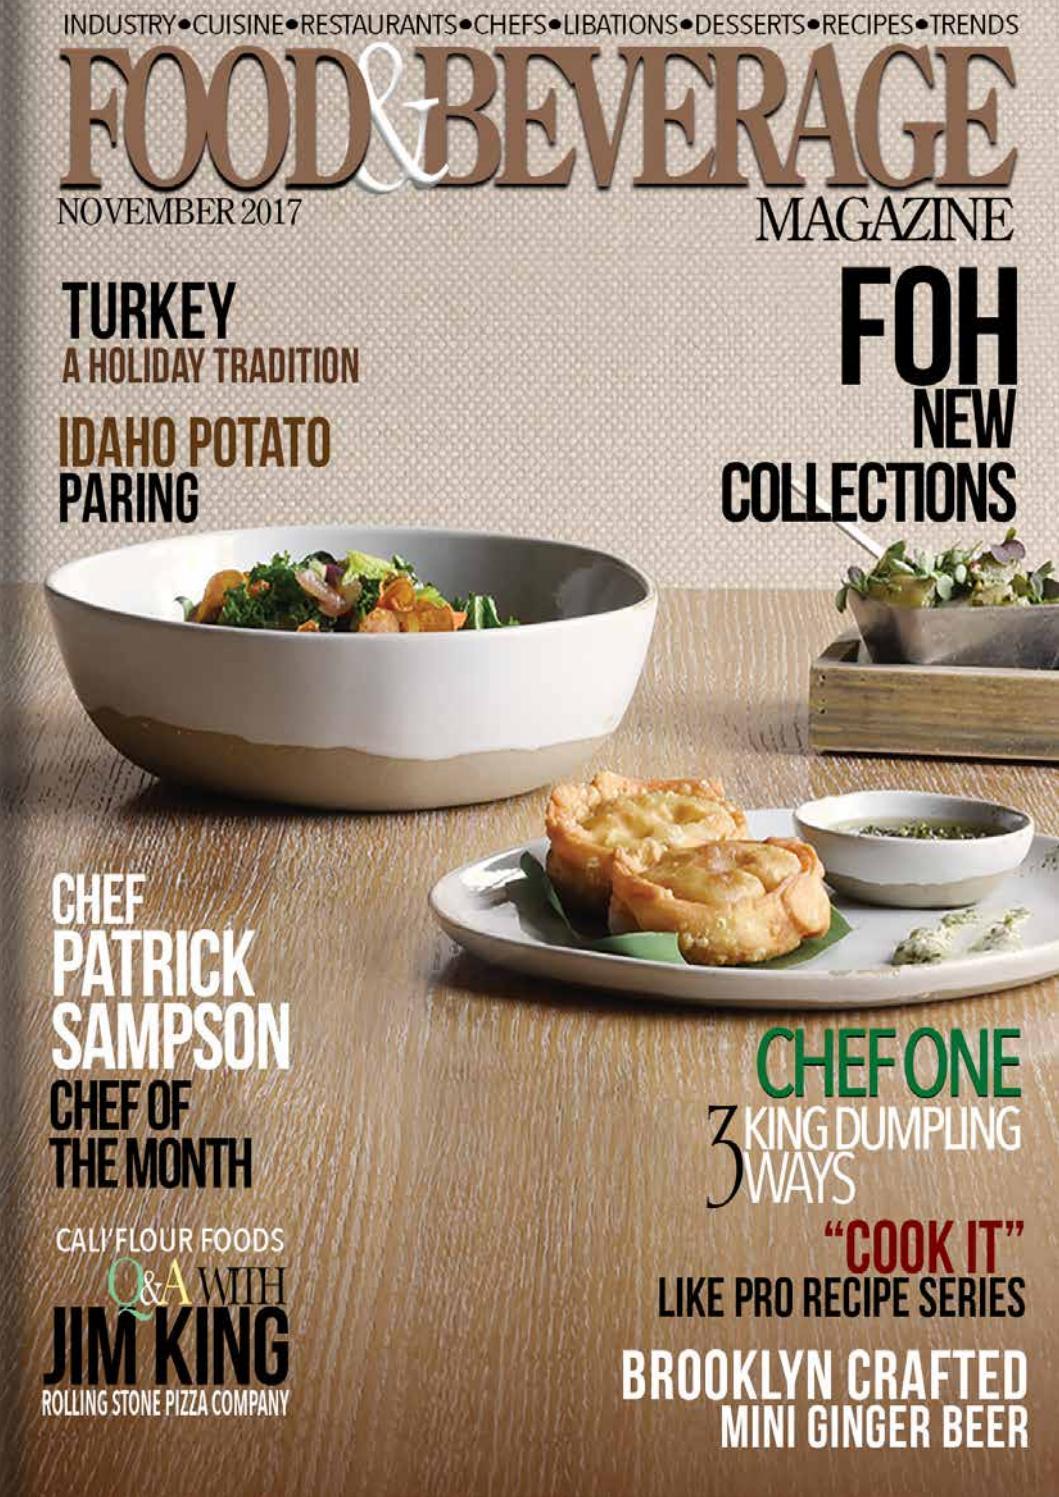 Food & Beverage Magazine November 2017 by Food & Beverage Magazine - issuu